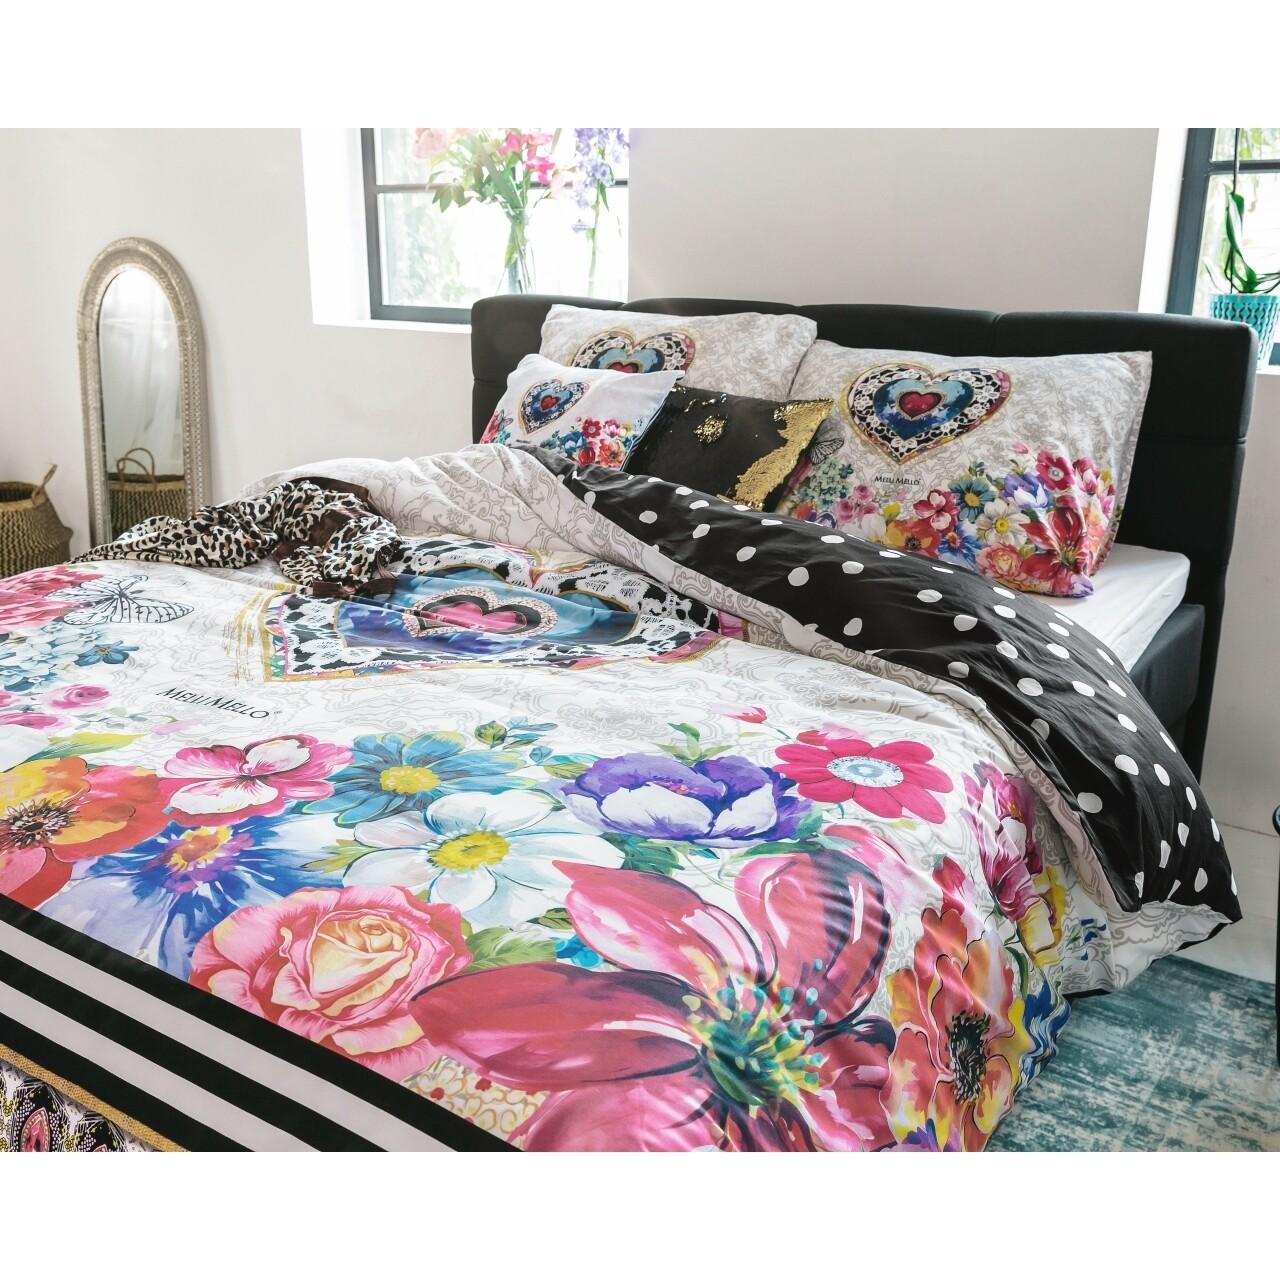 Lenjerie de pat dubla Amira White, Melli Mello, 3 piese, 200 x 220 cm, 100% bumbac satinat, multicolora